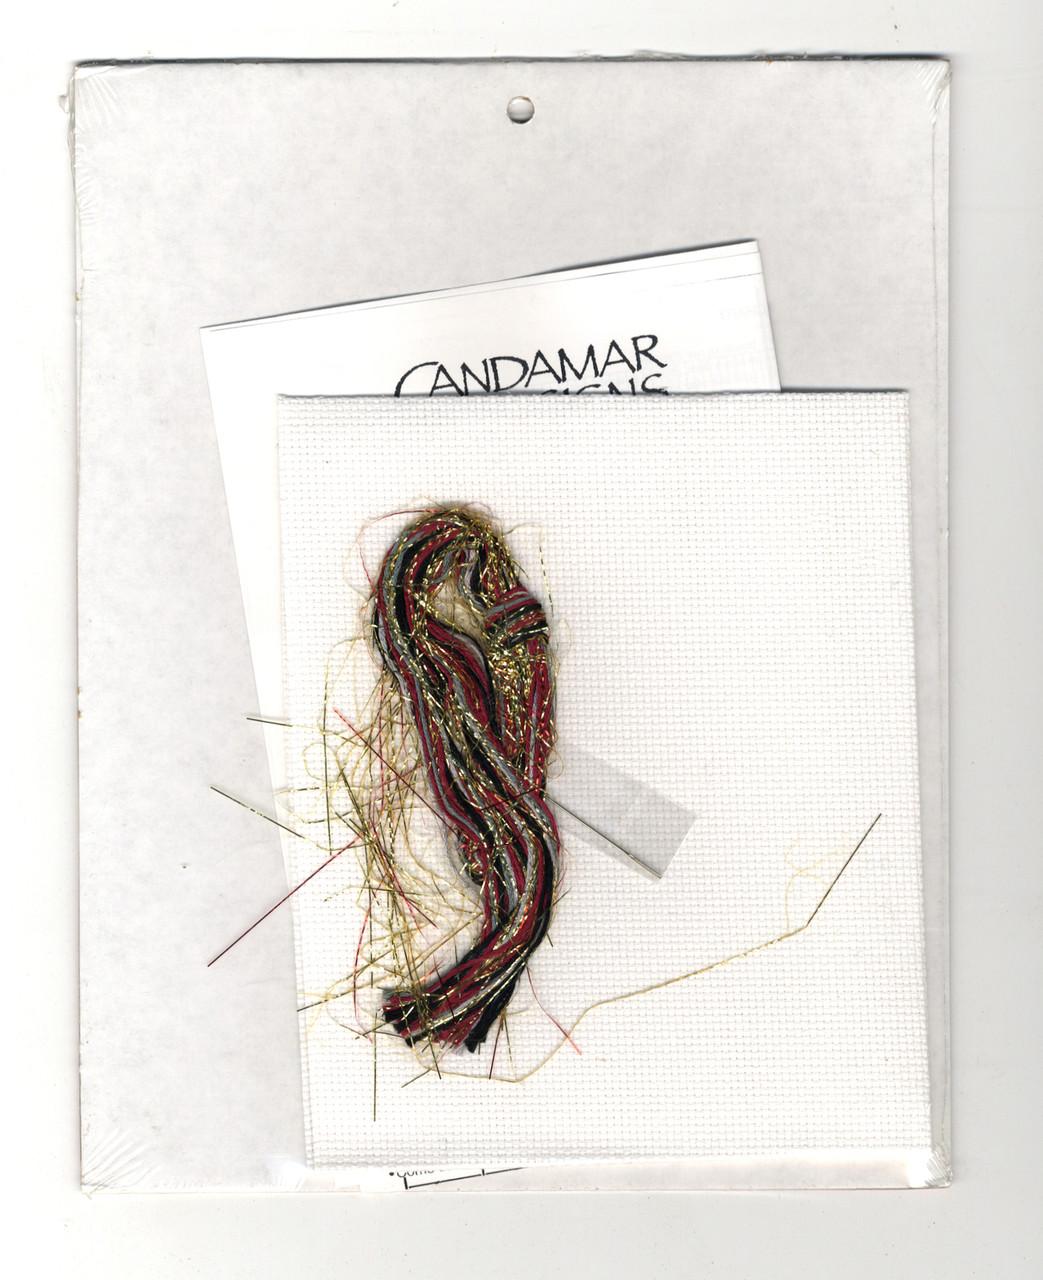 Candamar - Longevity